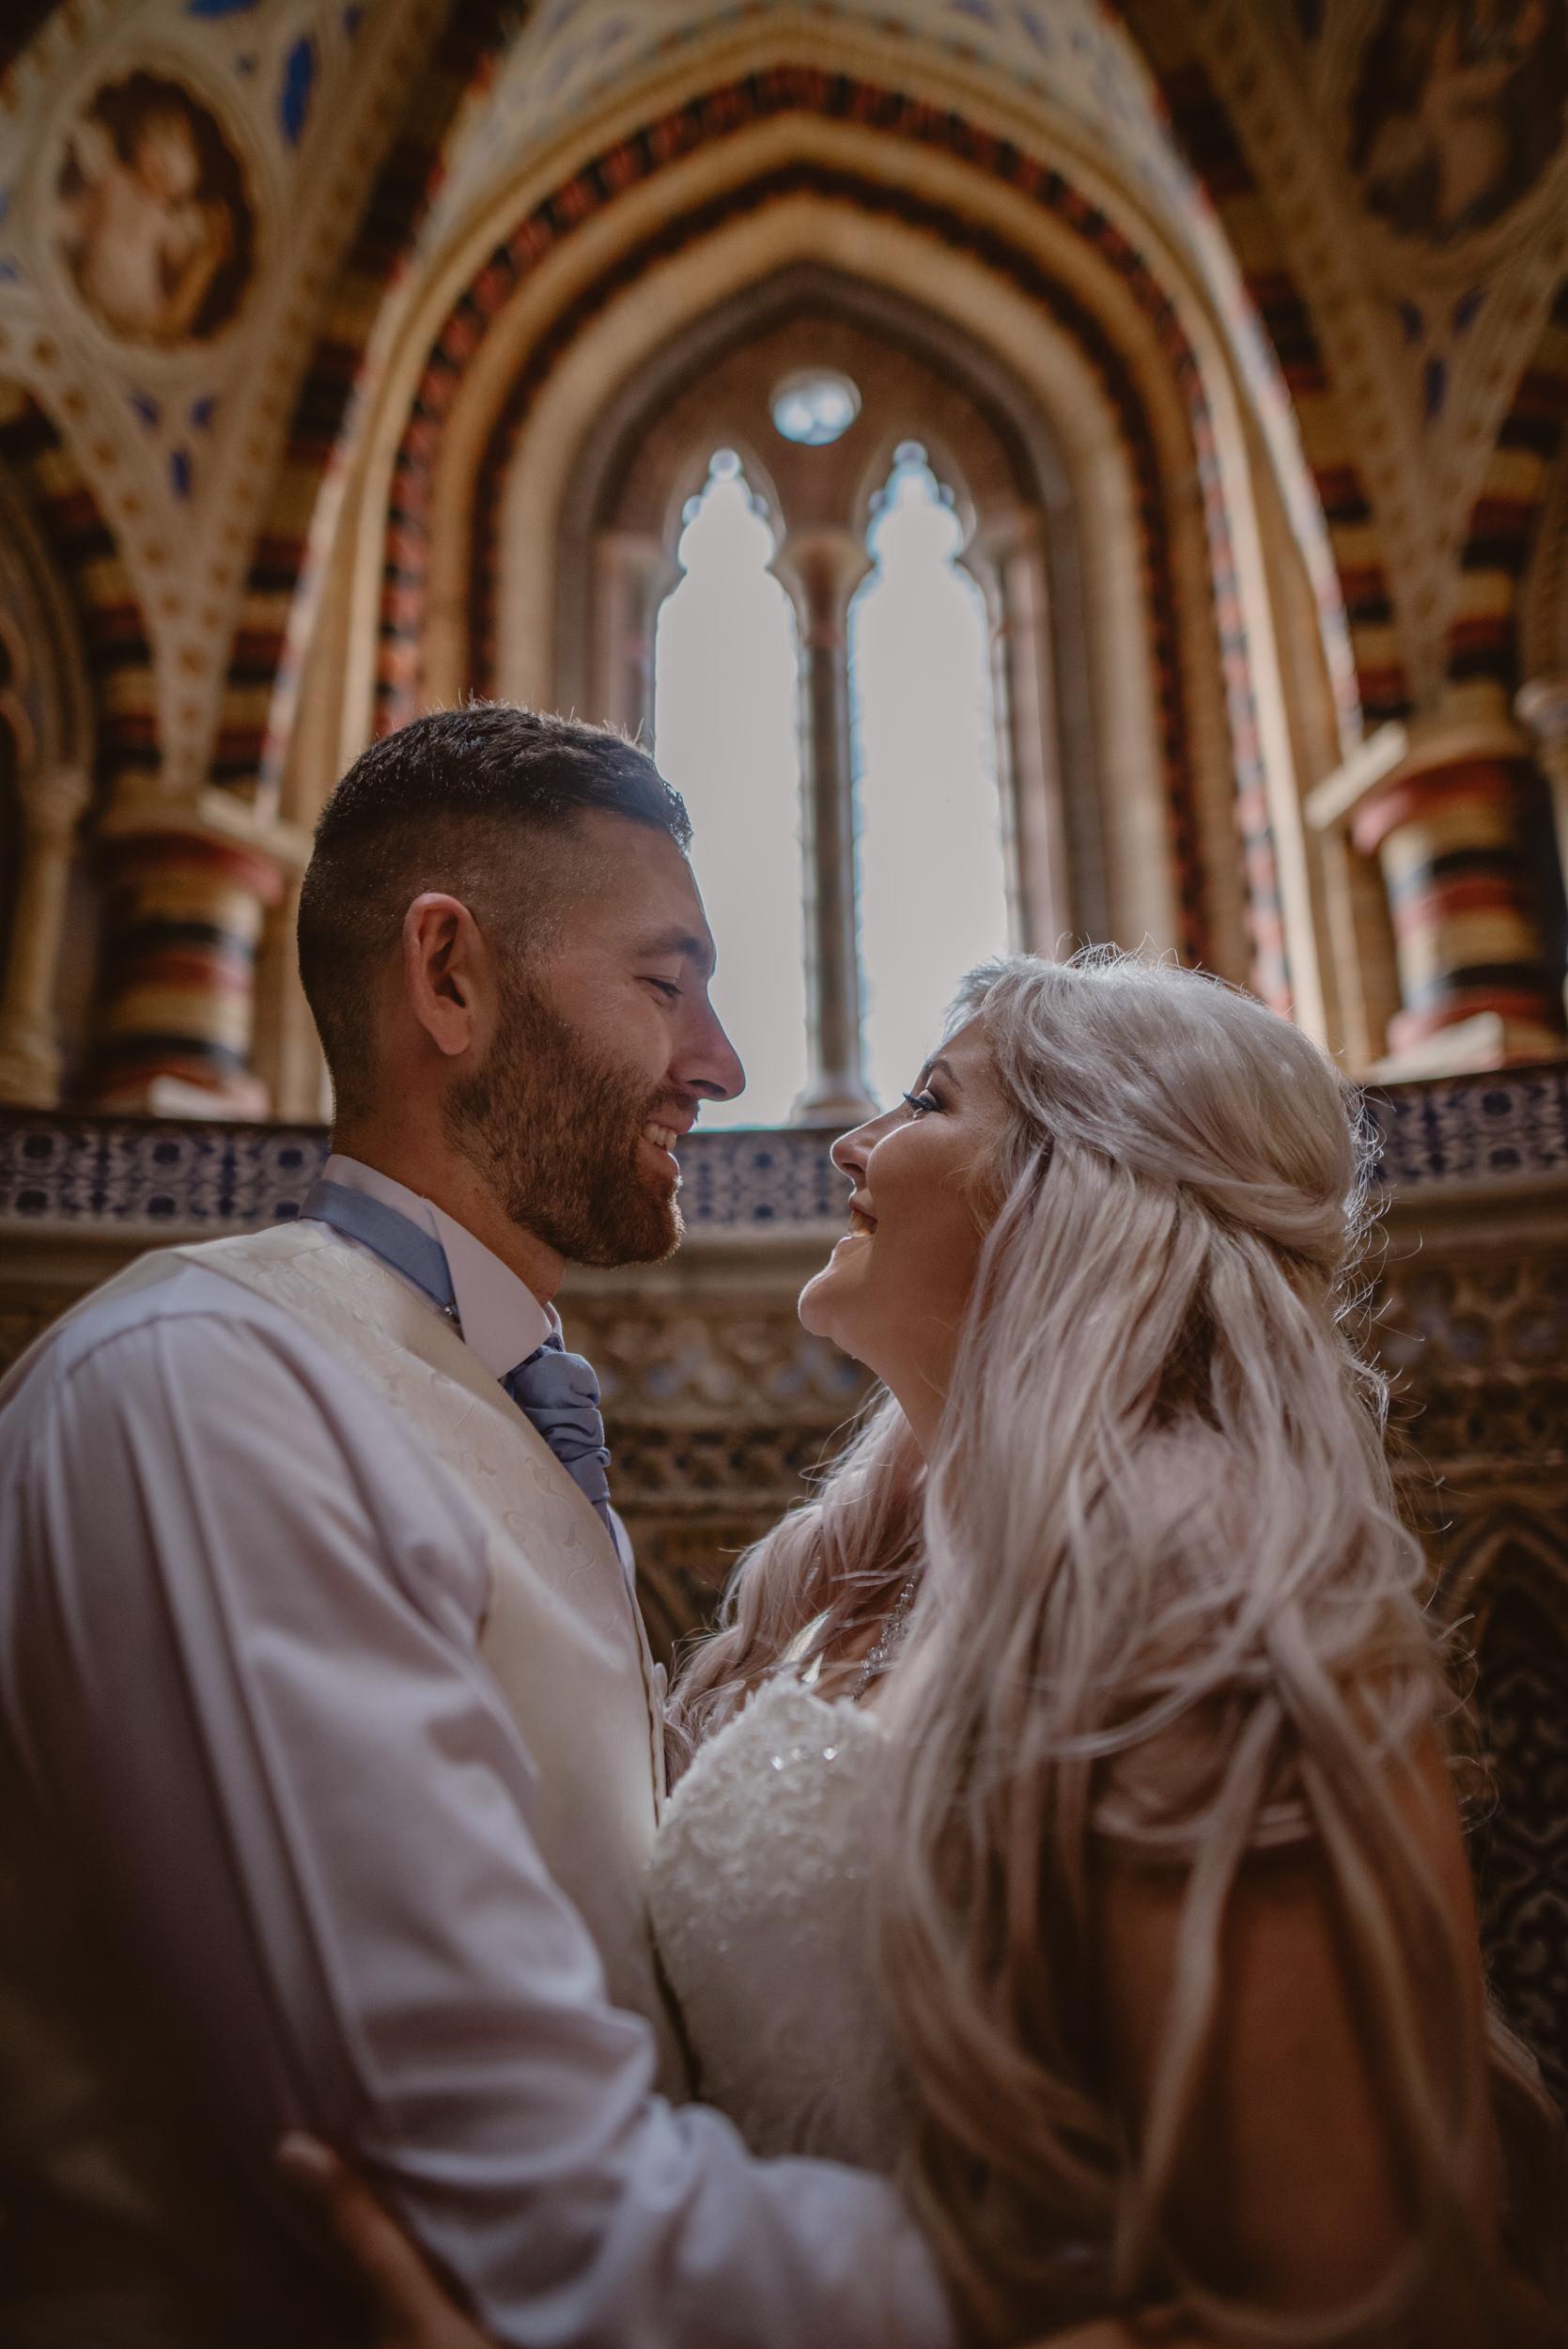 Rachel-and-James-Wedding-Horsley-Towers-State-Manu-Mendoza-Wedding-Photography-470.jpg